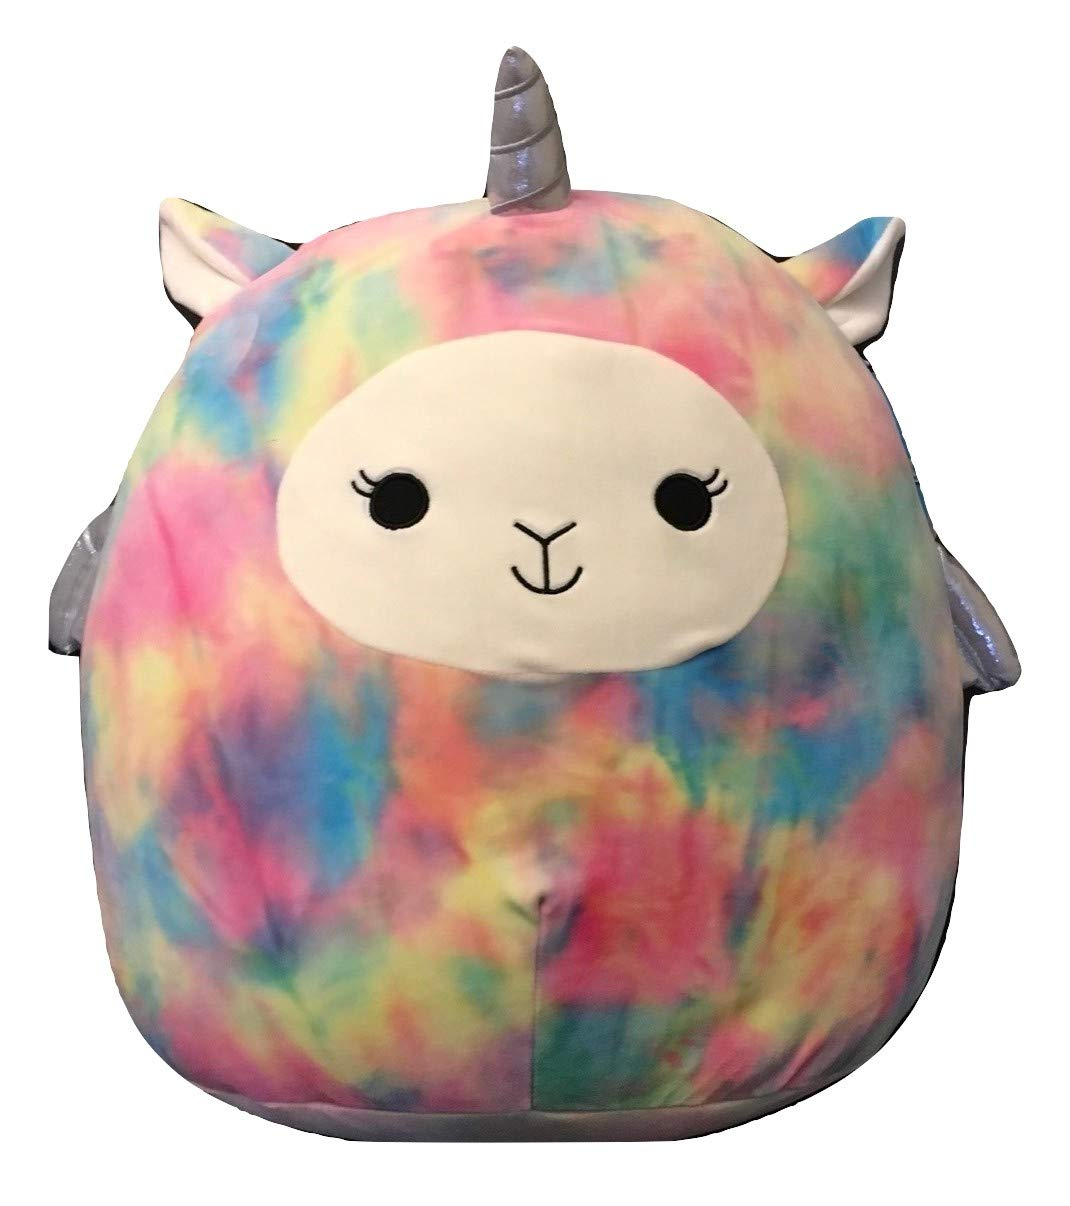 Squishmallow 12 Inch Tye Dye Unicorn Lola Stuffed Plush Toy